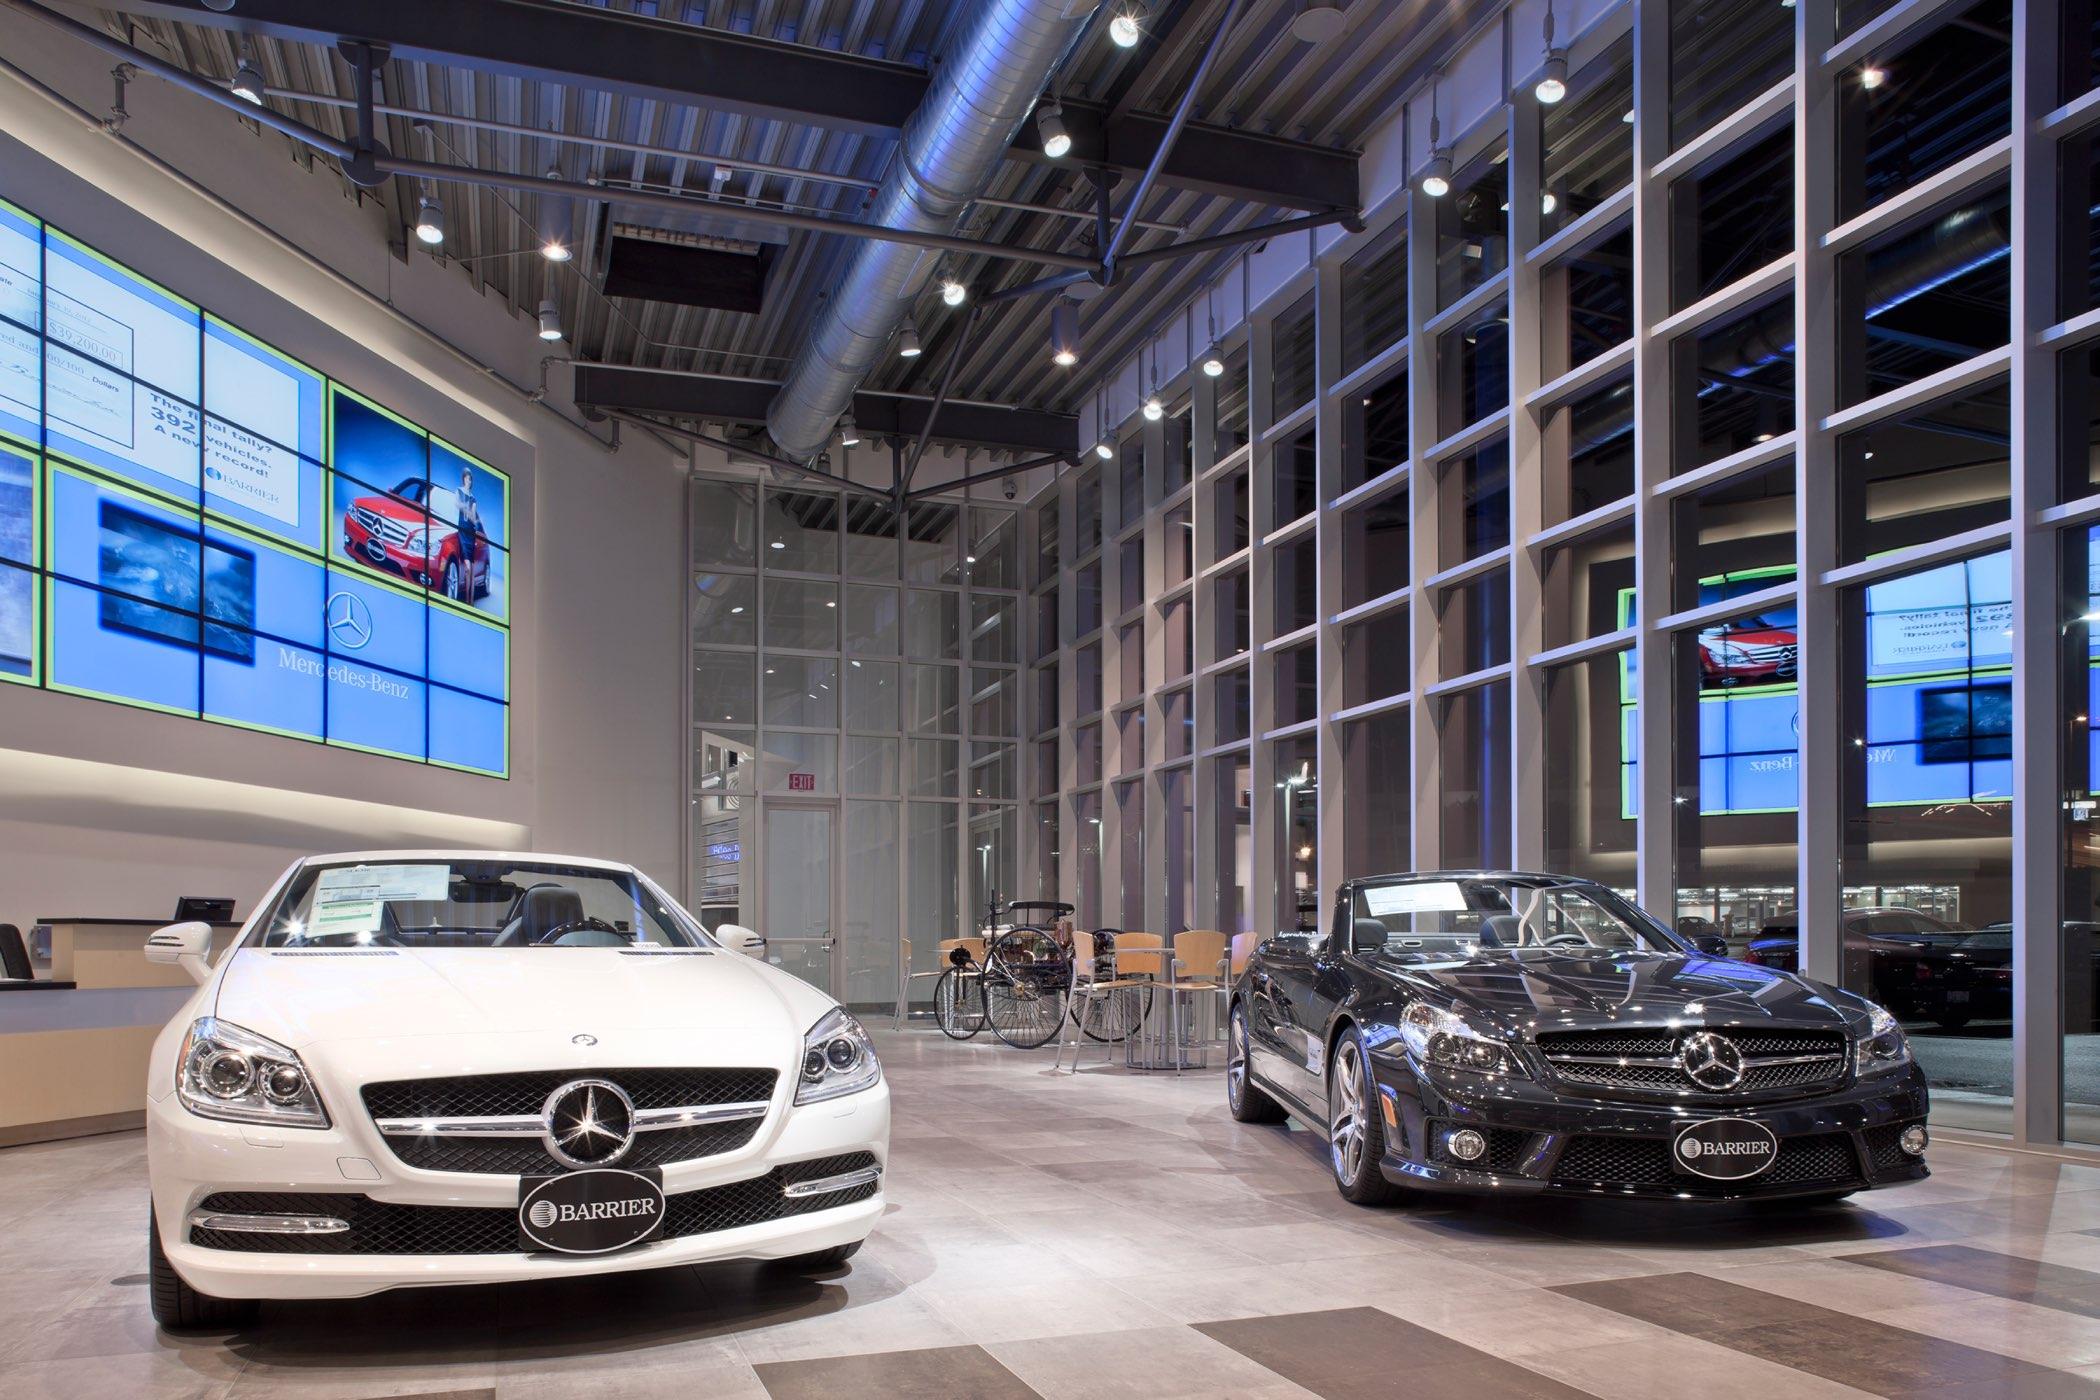 Barrier Autohaus Studio Lux